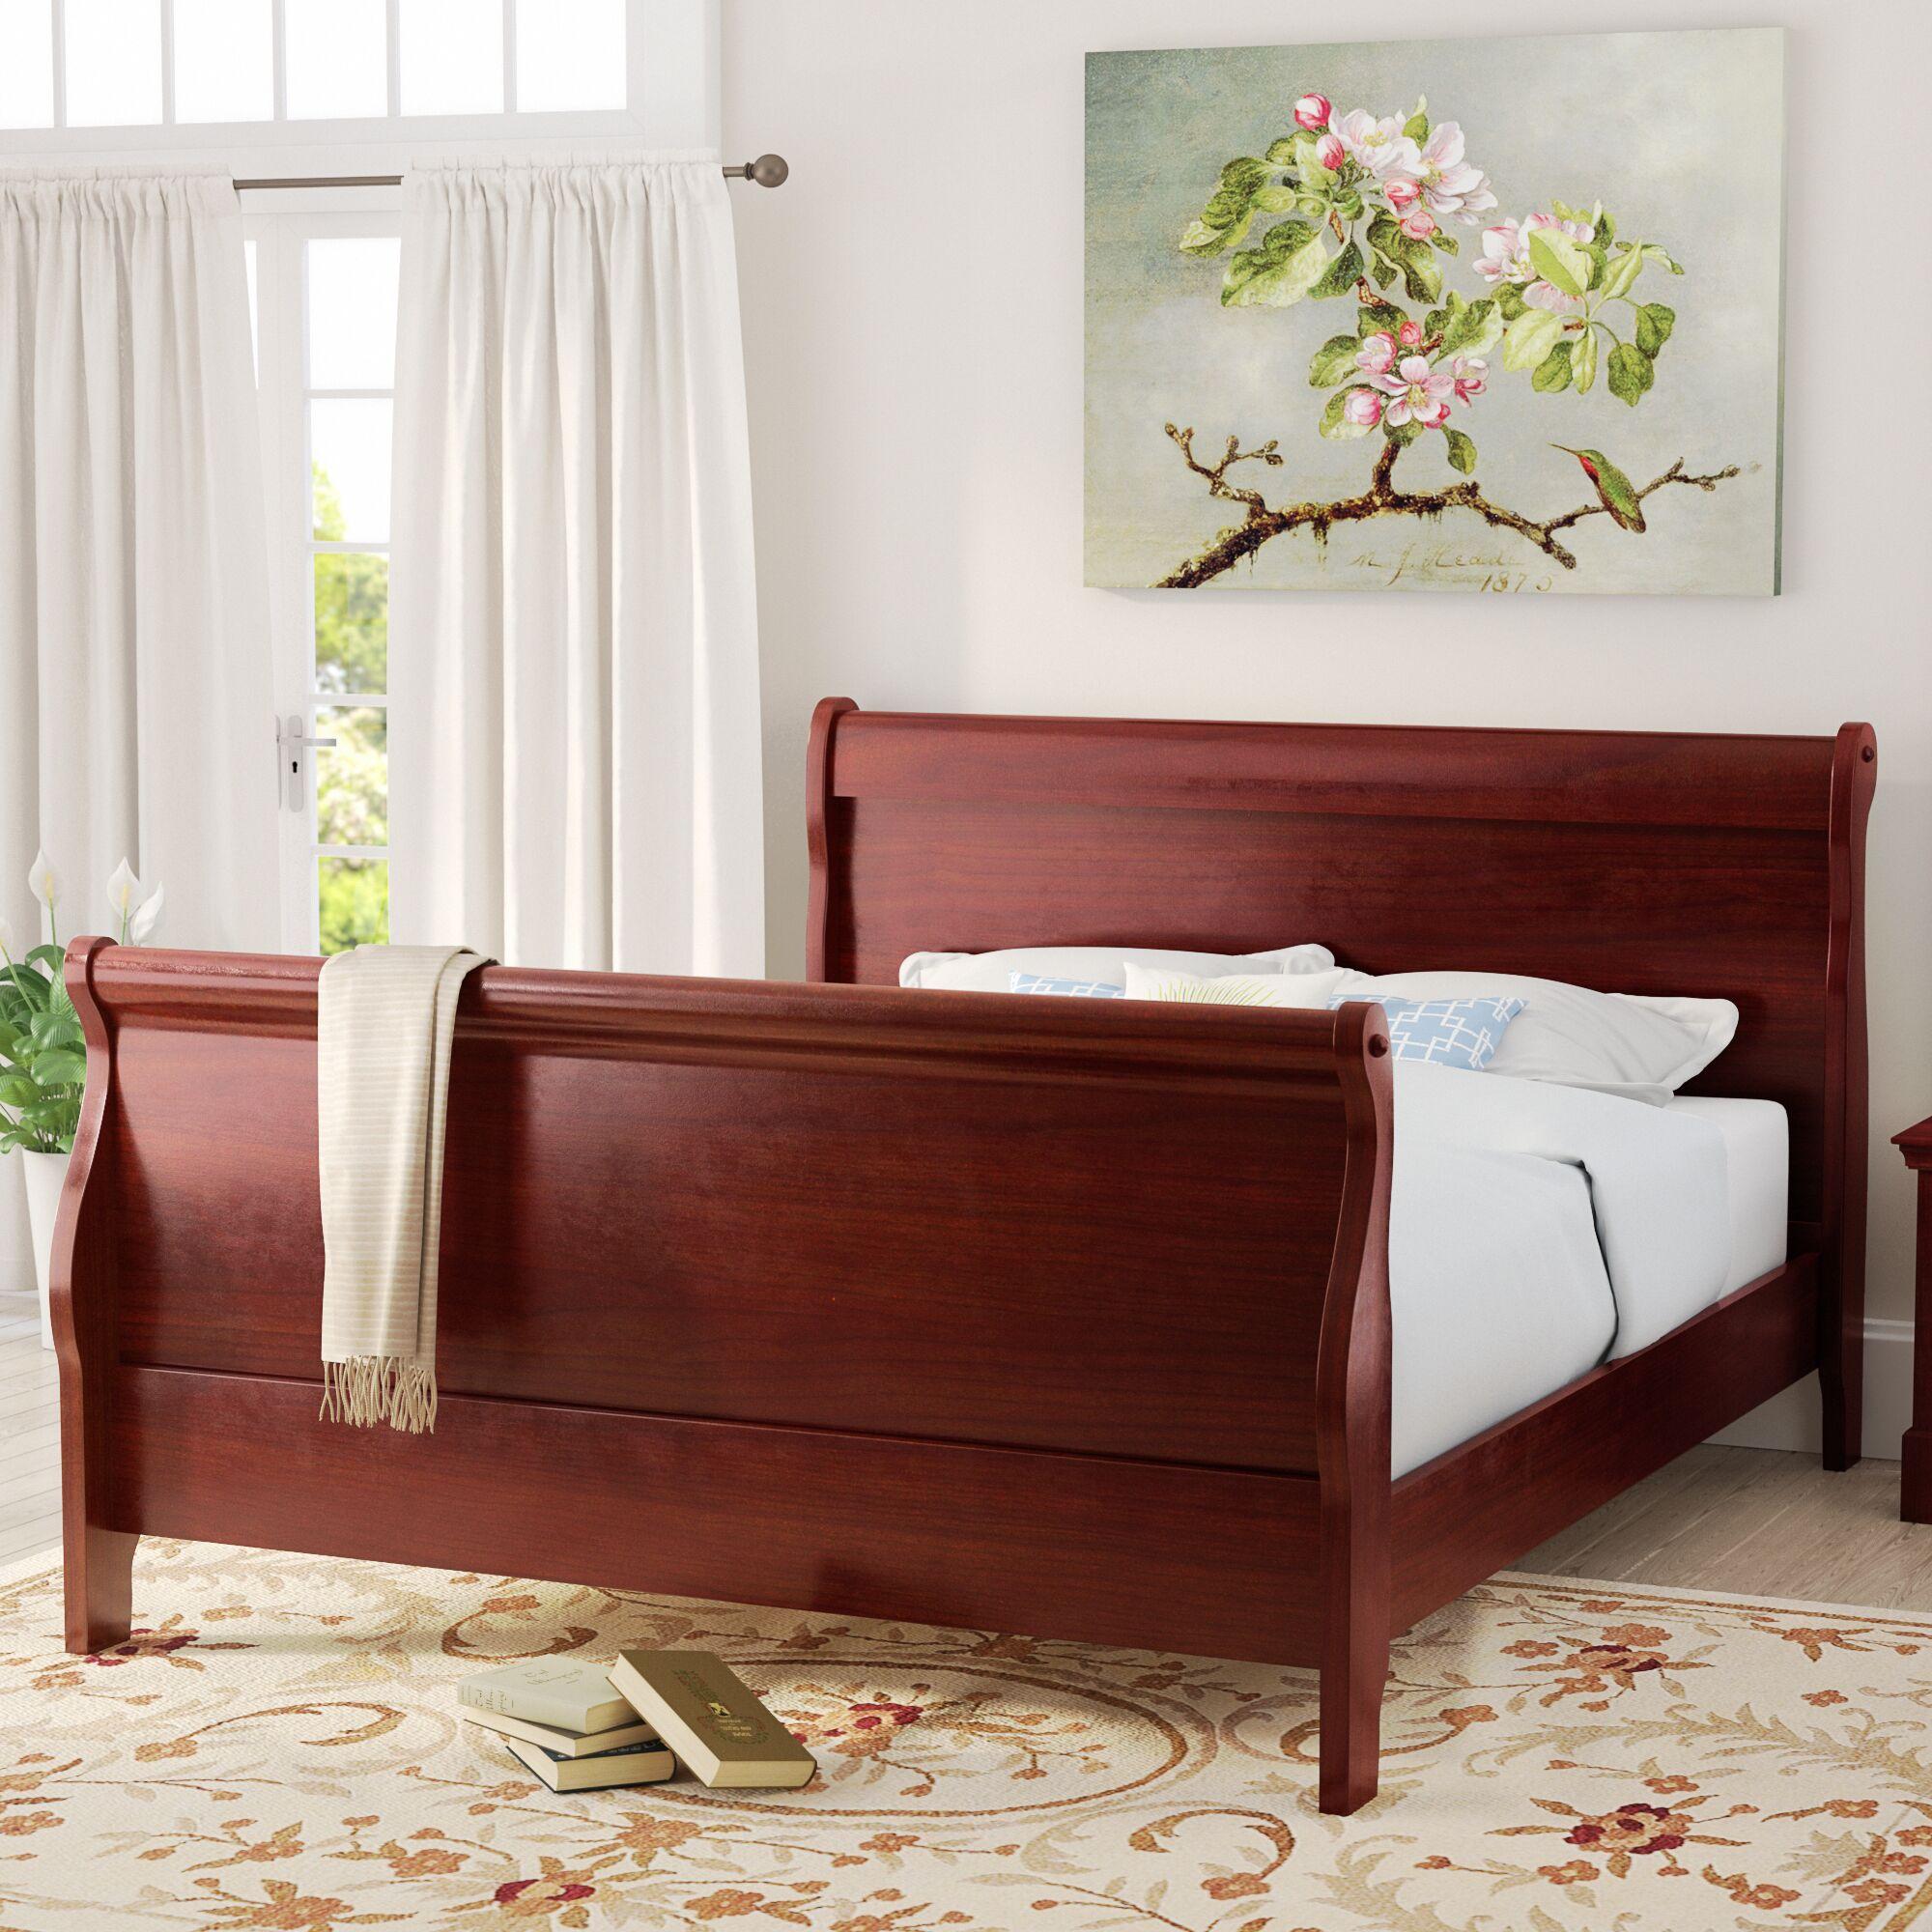 Tina Contemporary Sleigh Bed Size: King